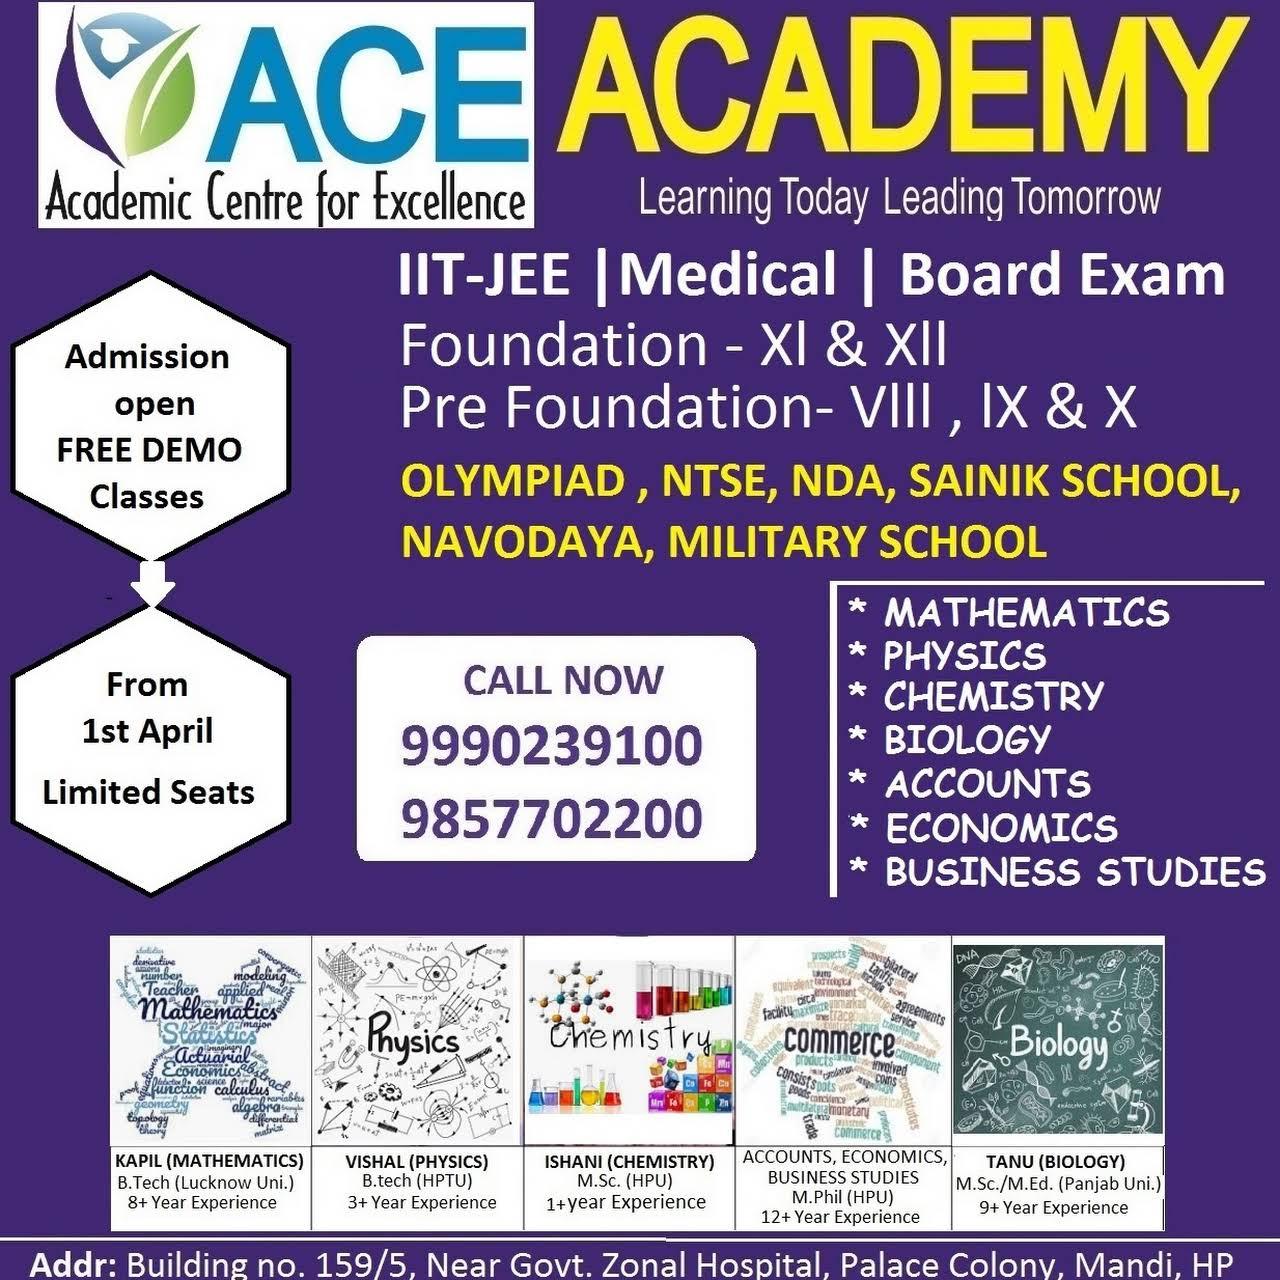 ACE Academy Mandi - Education Center in Mandi